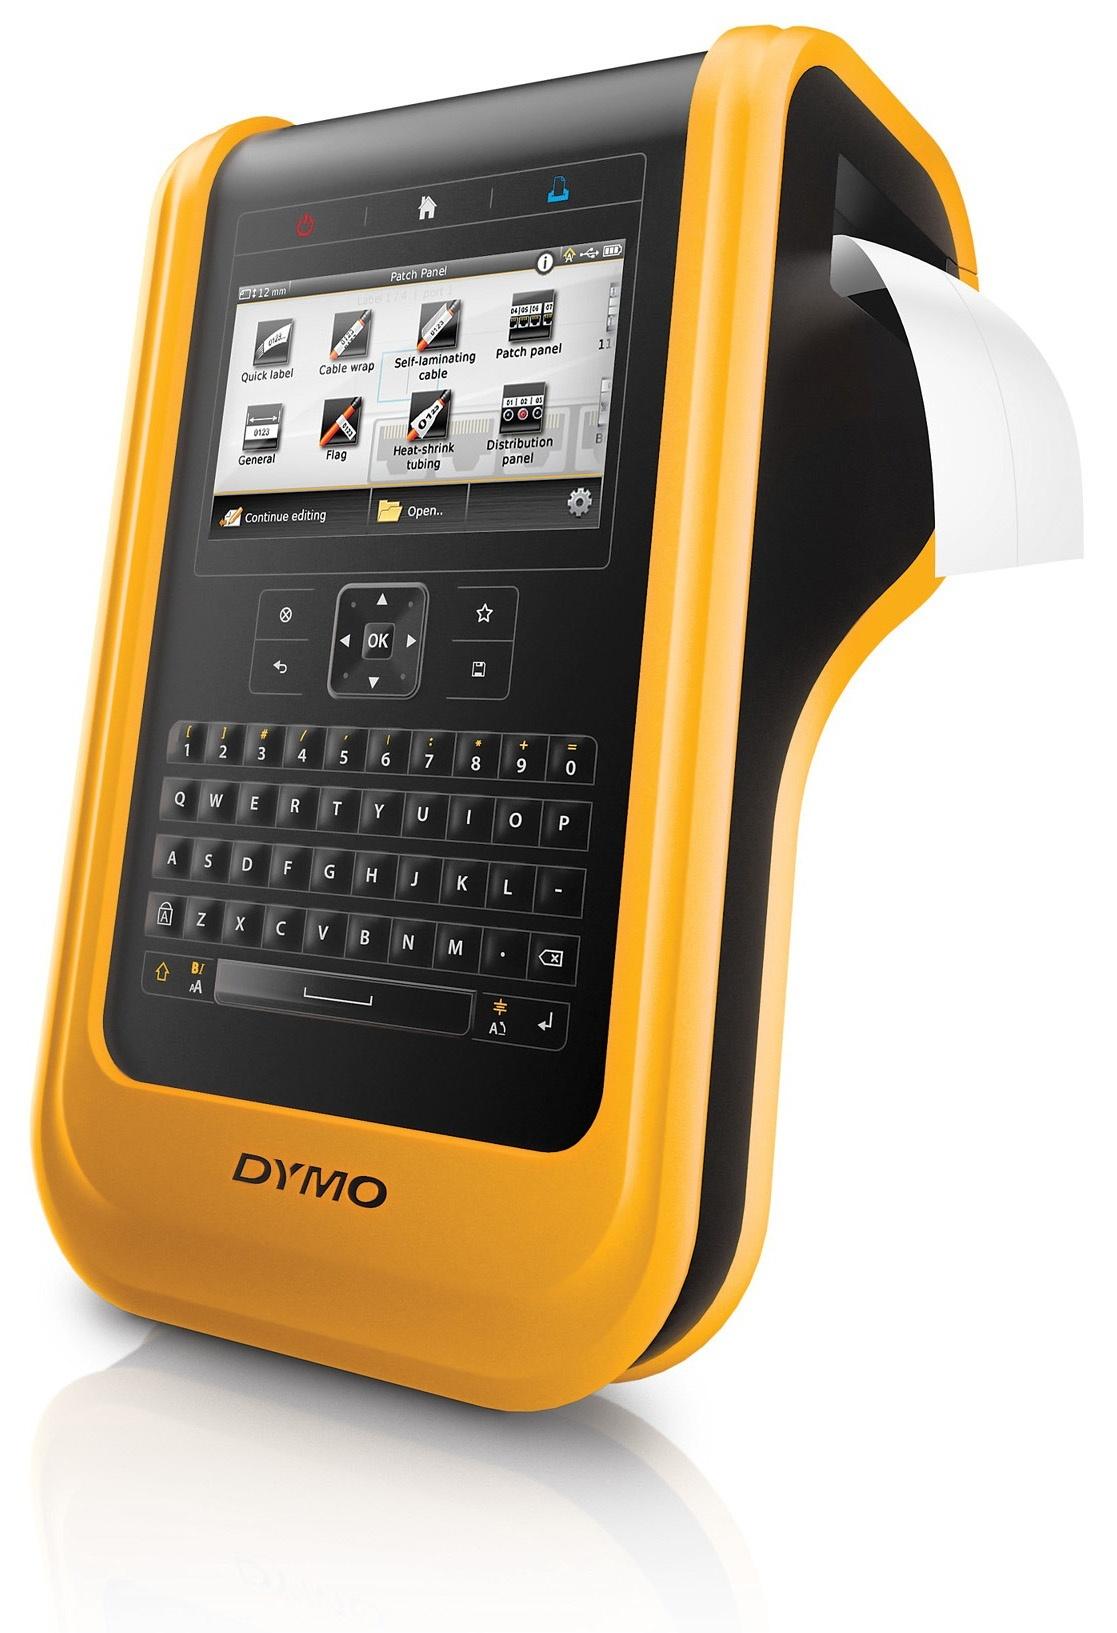 dymo_industrial-xtl500-kit-printer-qwy-closed_00302-2.jpg